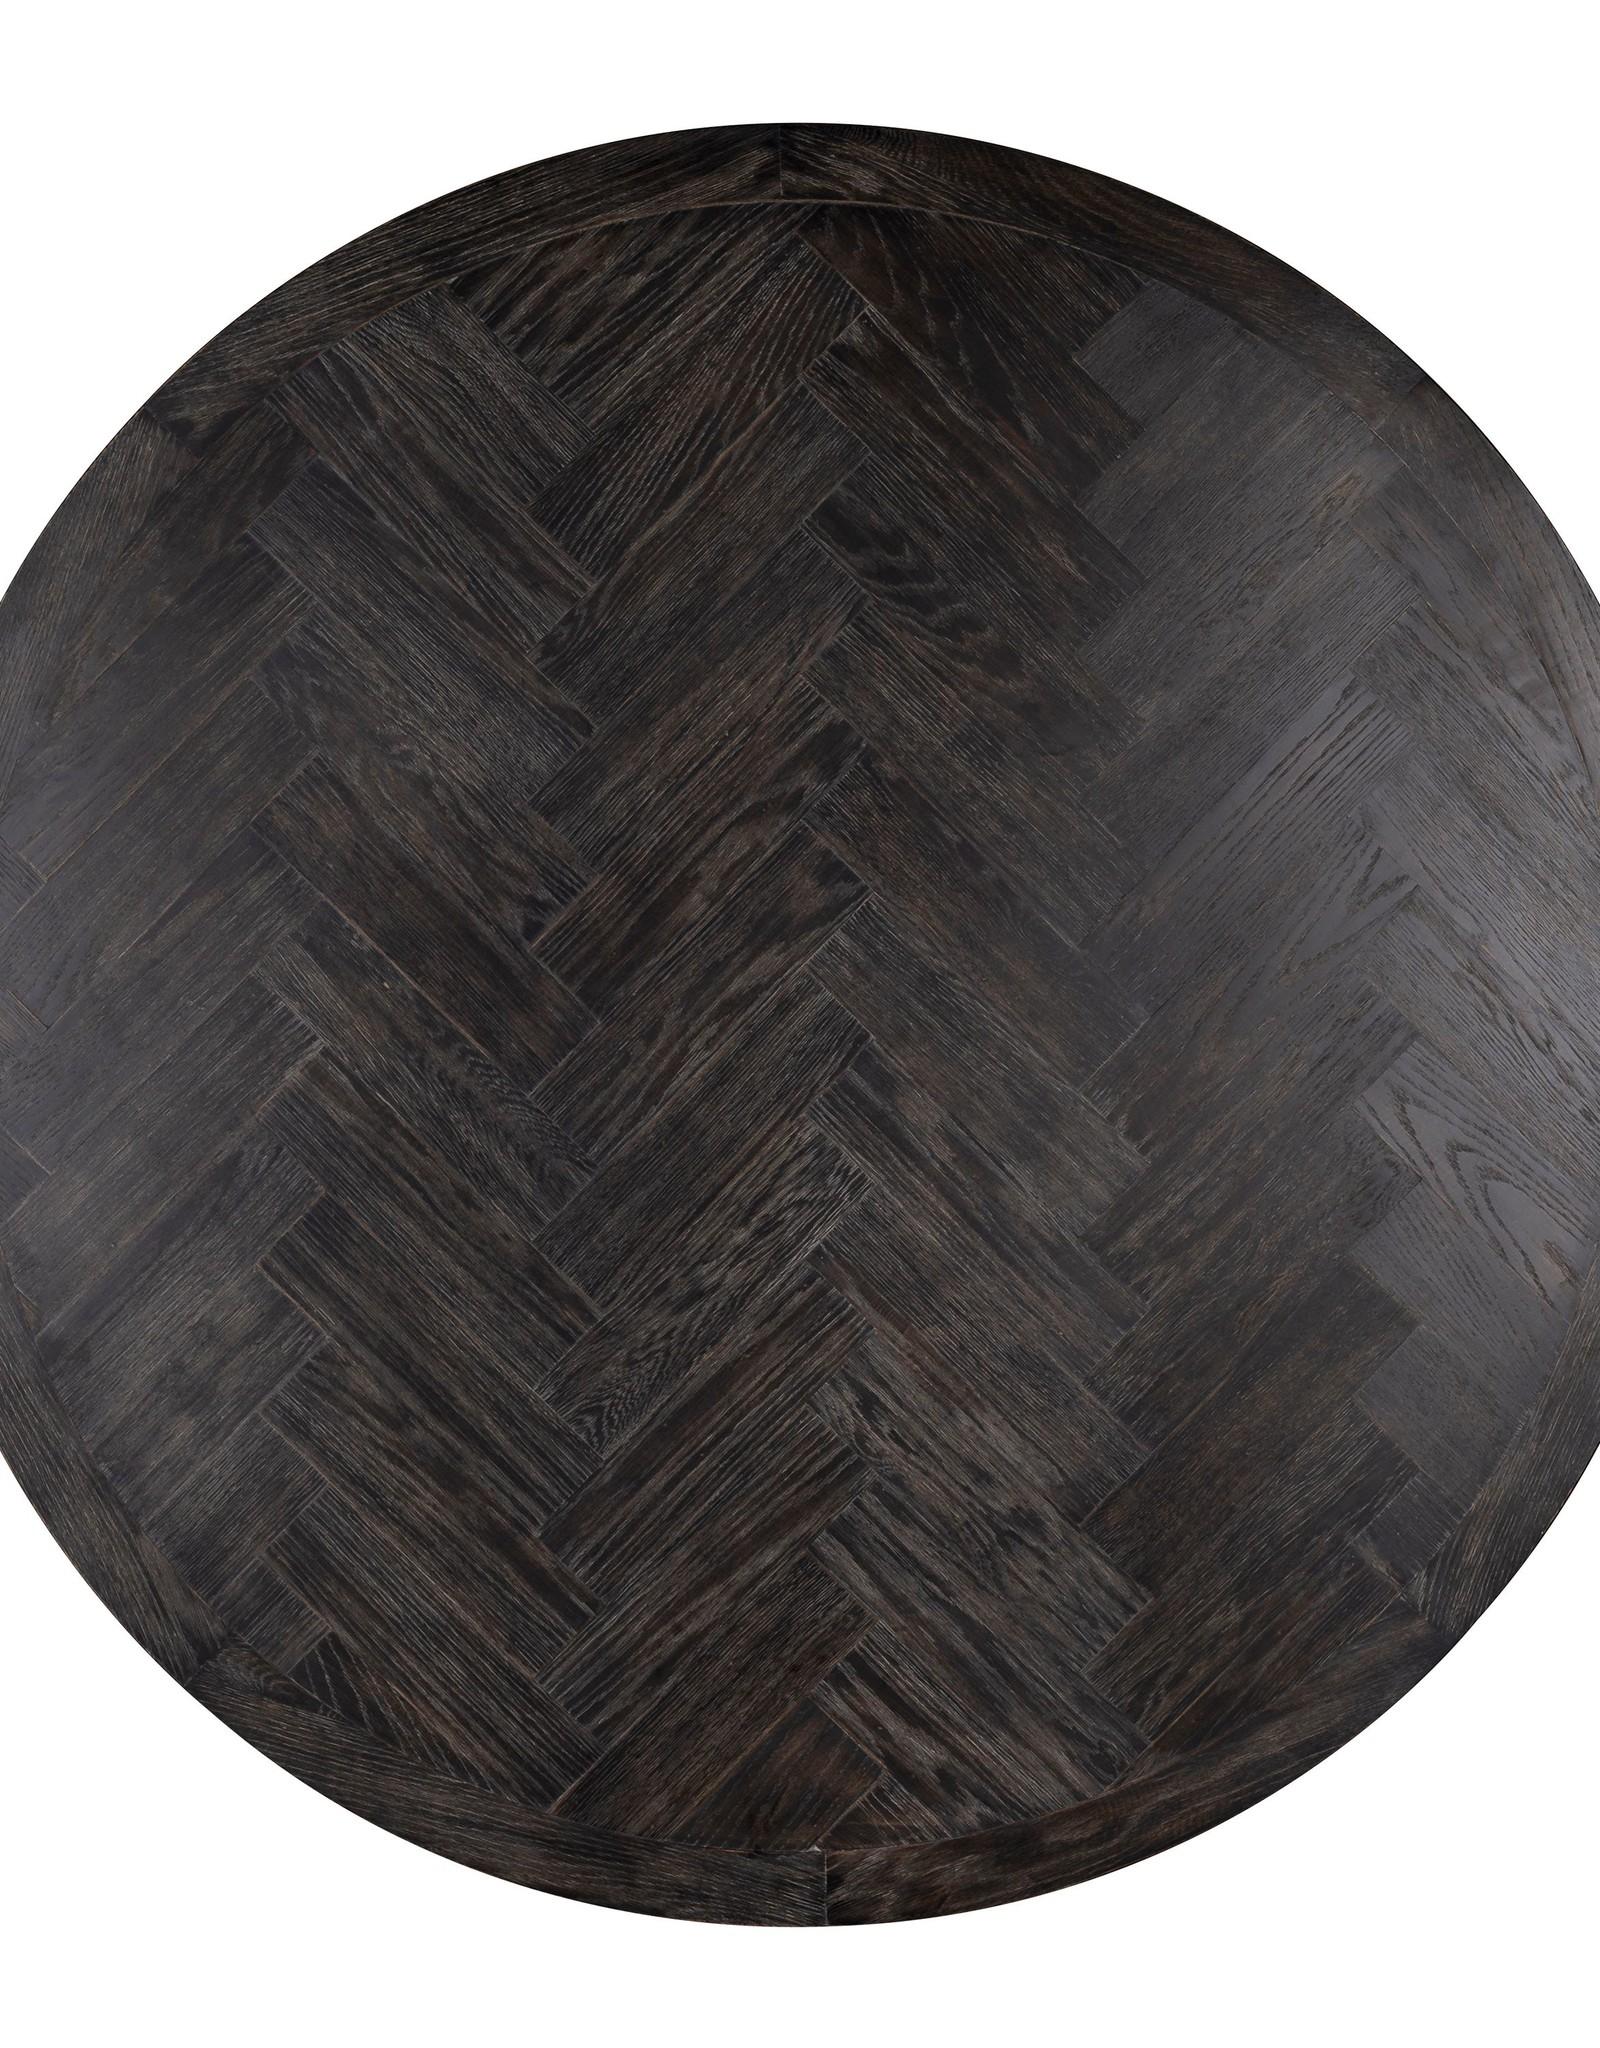 Eettafel Blackbone rond Ø140 zilver